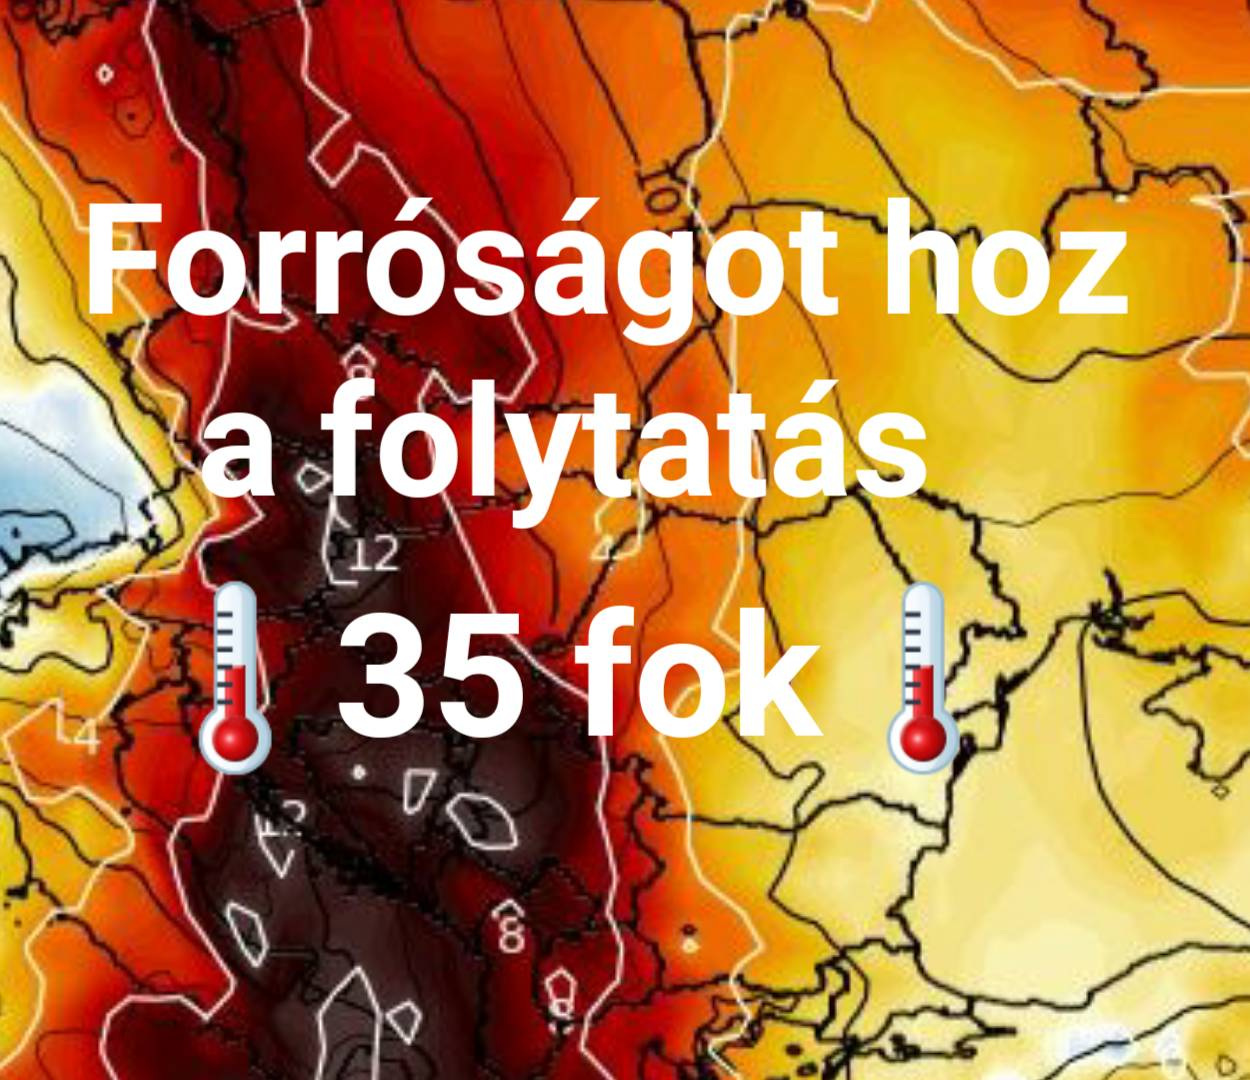 Tartós hőhullám jön: 35 fokos hőség, majd viharok! 3